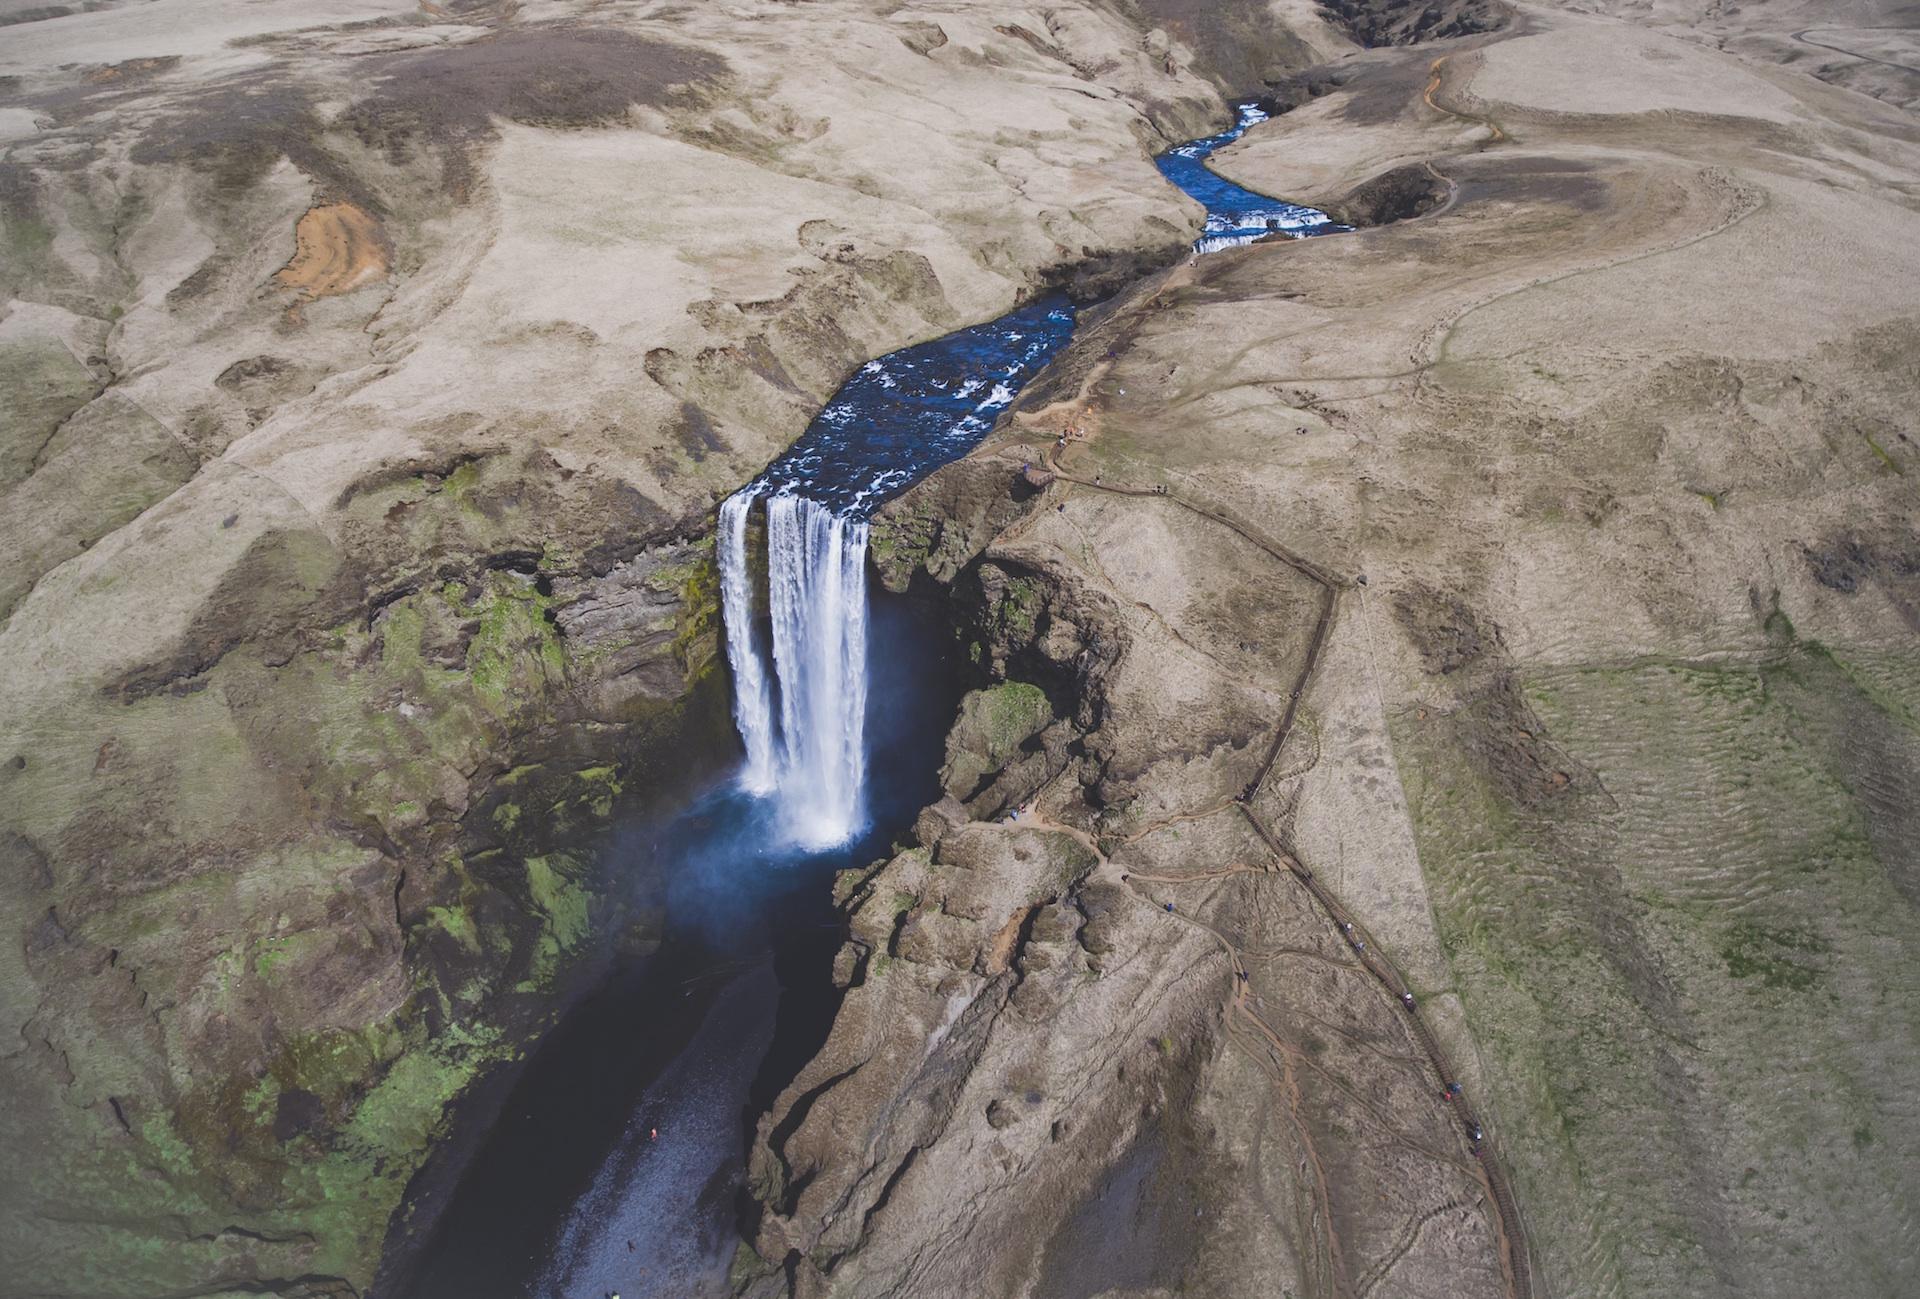 río, catarata, cascada, agua, islandia - Fondos de Pantalla HD - professor-falken.com